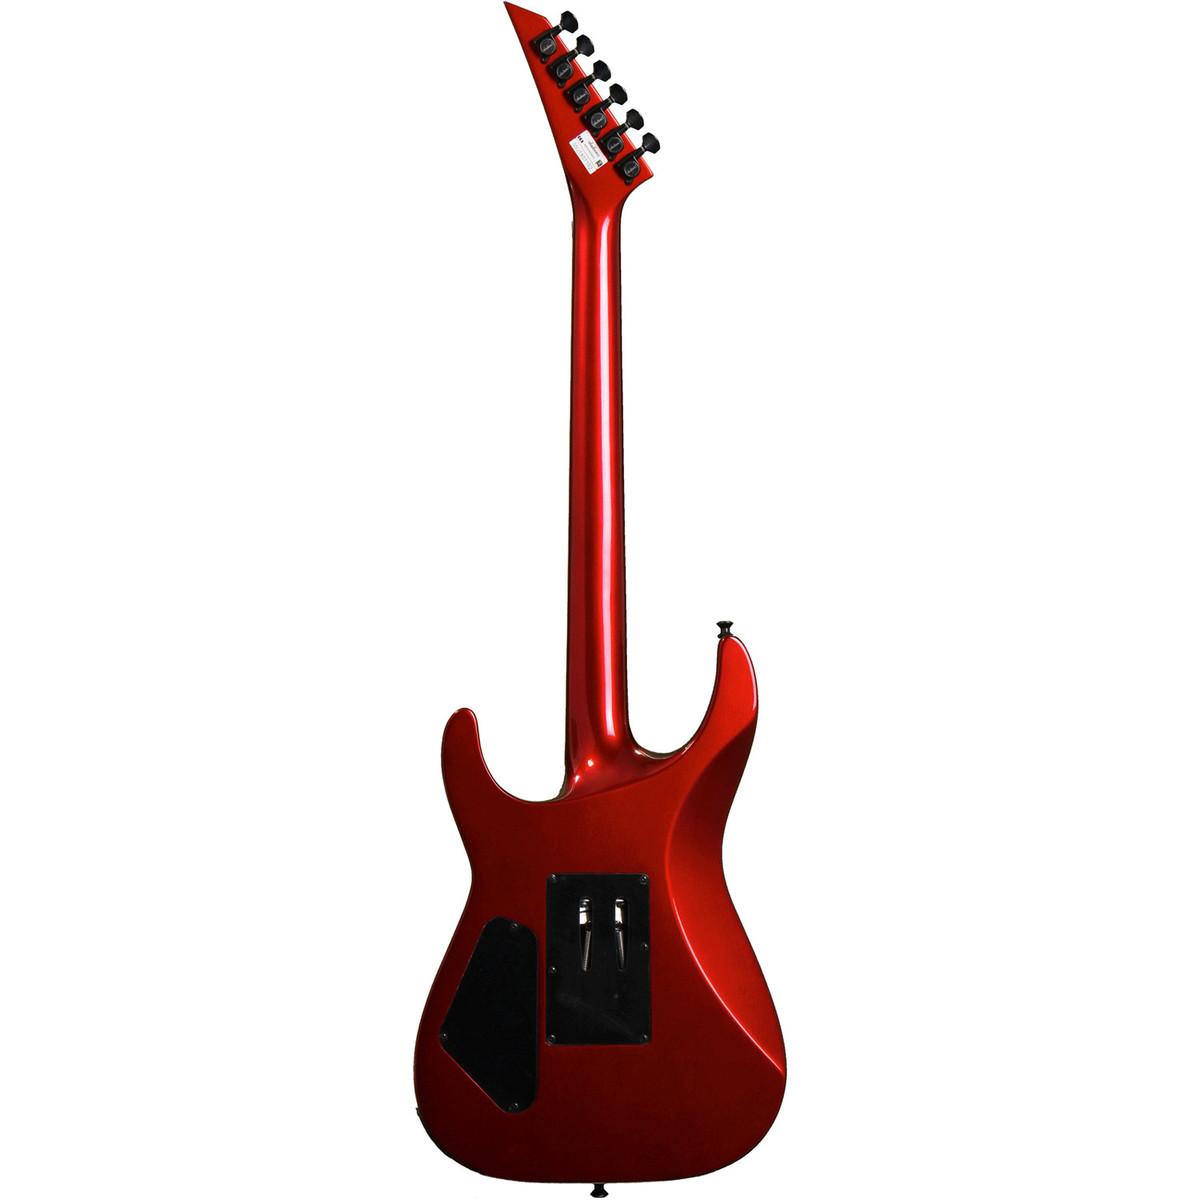 jackson x series soloist slx electric guitar metallic red at. Black Bedroom Furniture Sets. Home Design Ideas